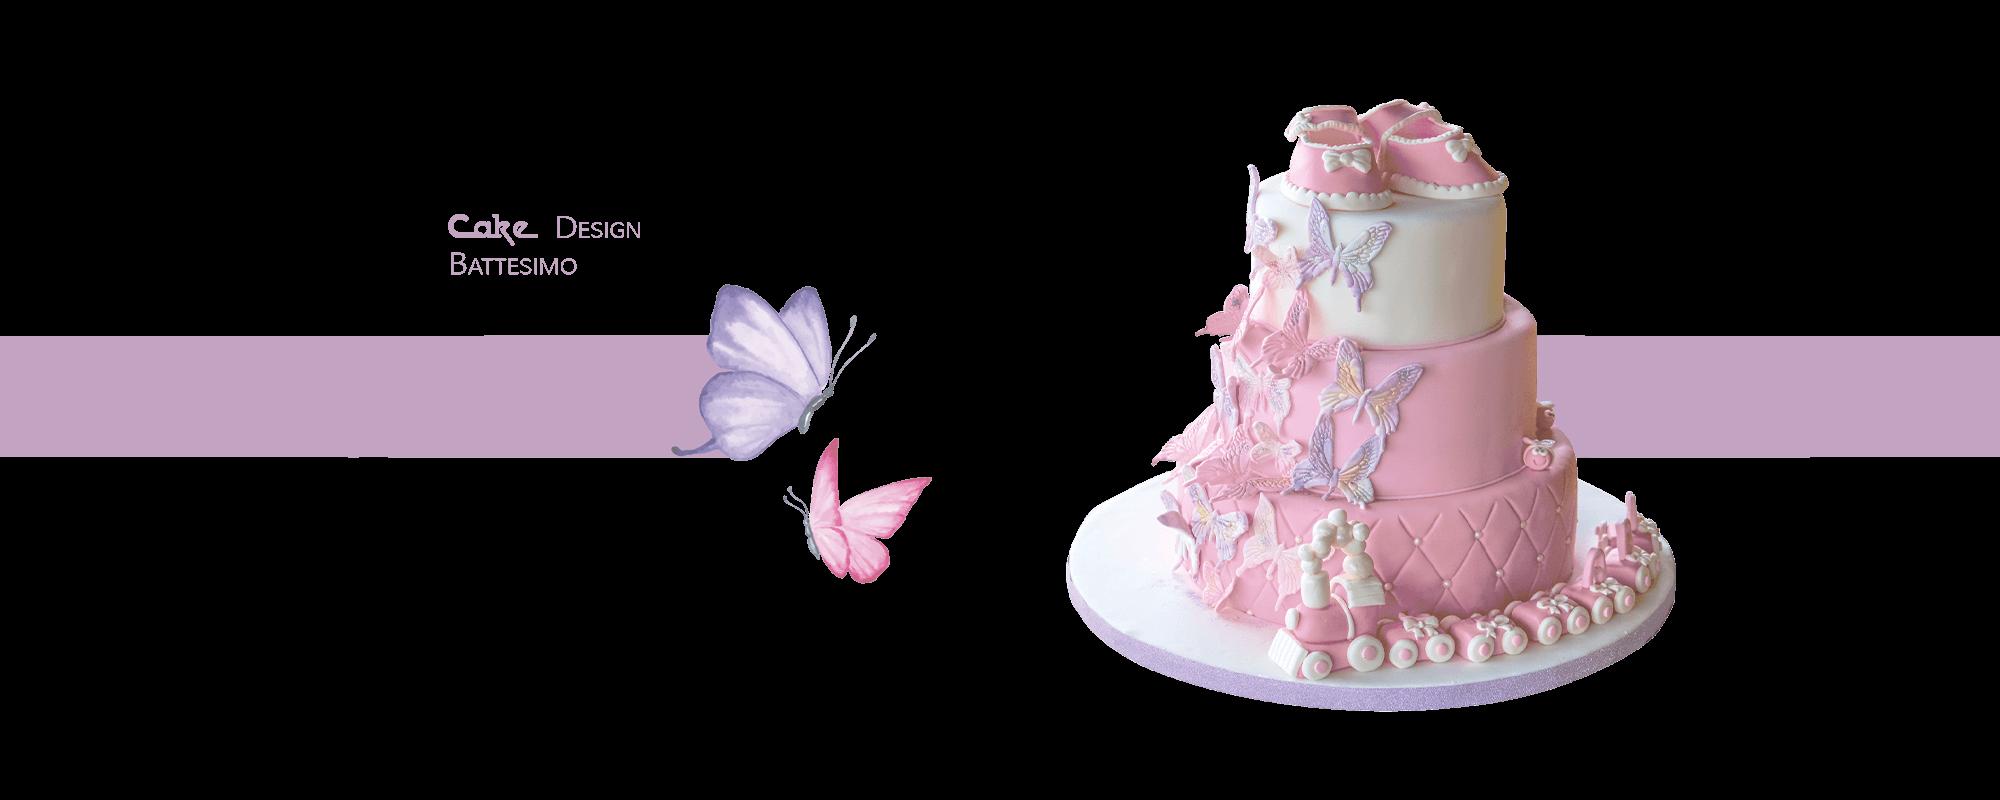 CAKE-DESIGN-BATTESIMO